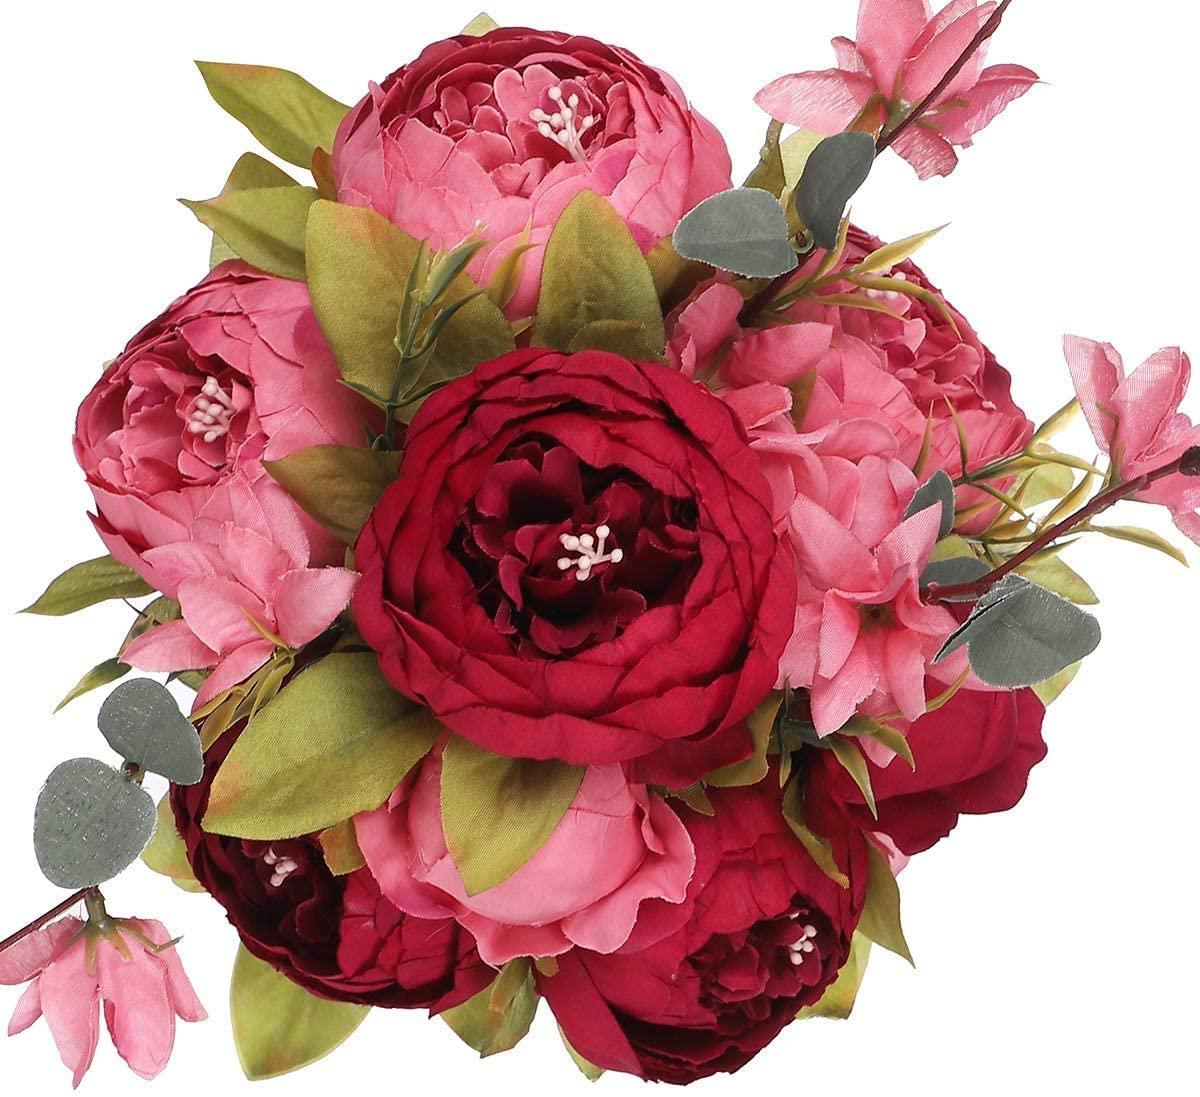 Floralsecret Artificial Silk Peony Flower Vintage Fake Bouquet Home Wedding Decor(New Dark Red)